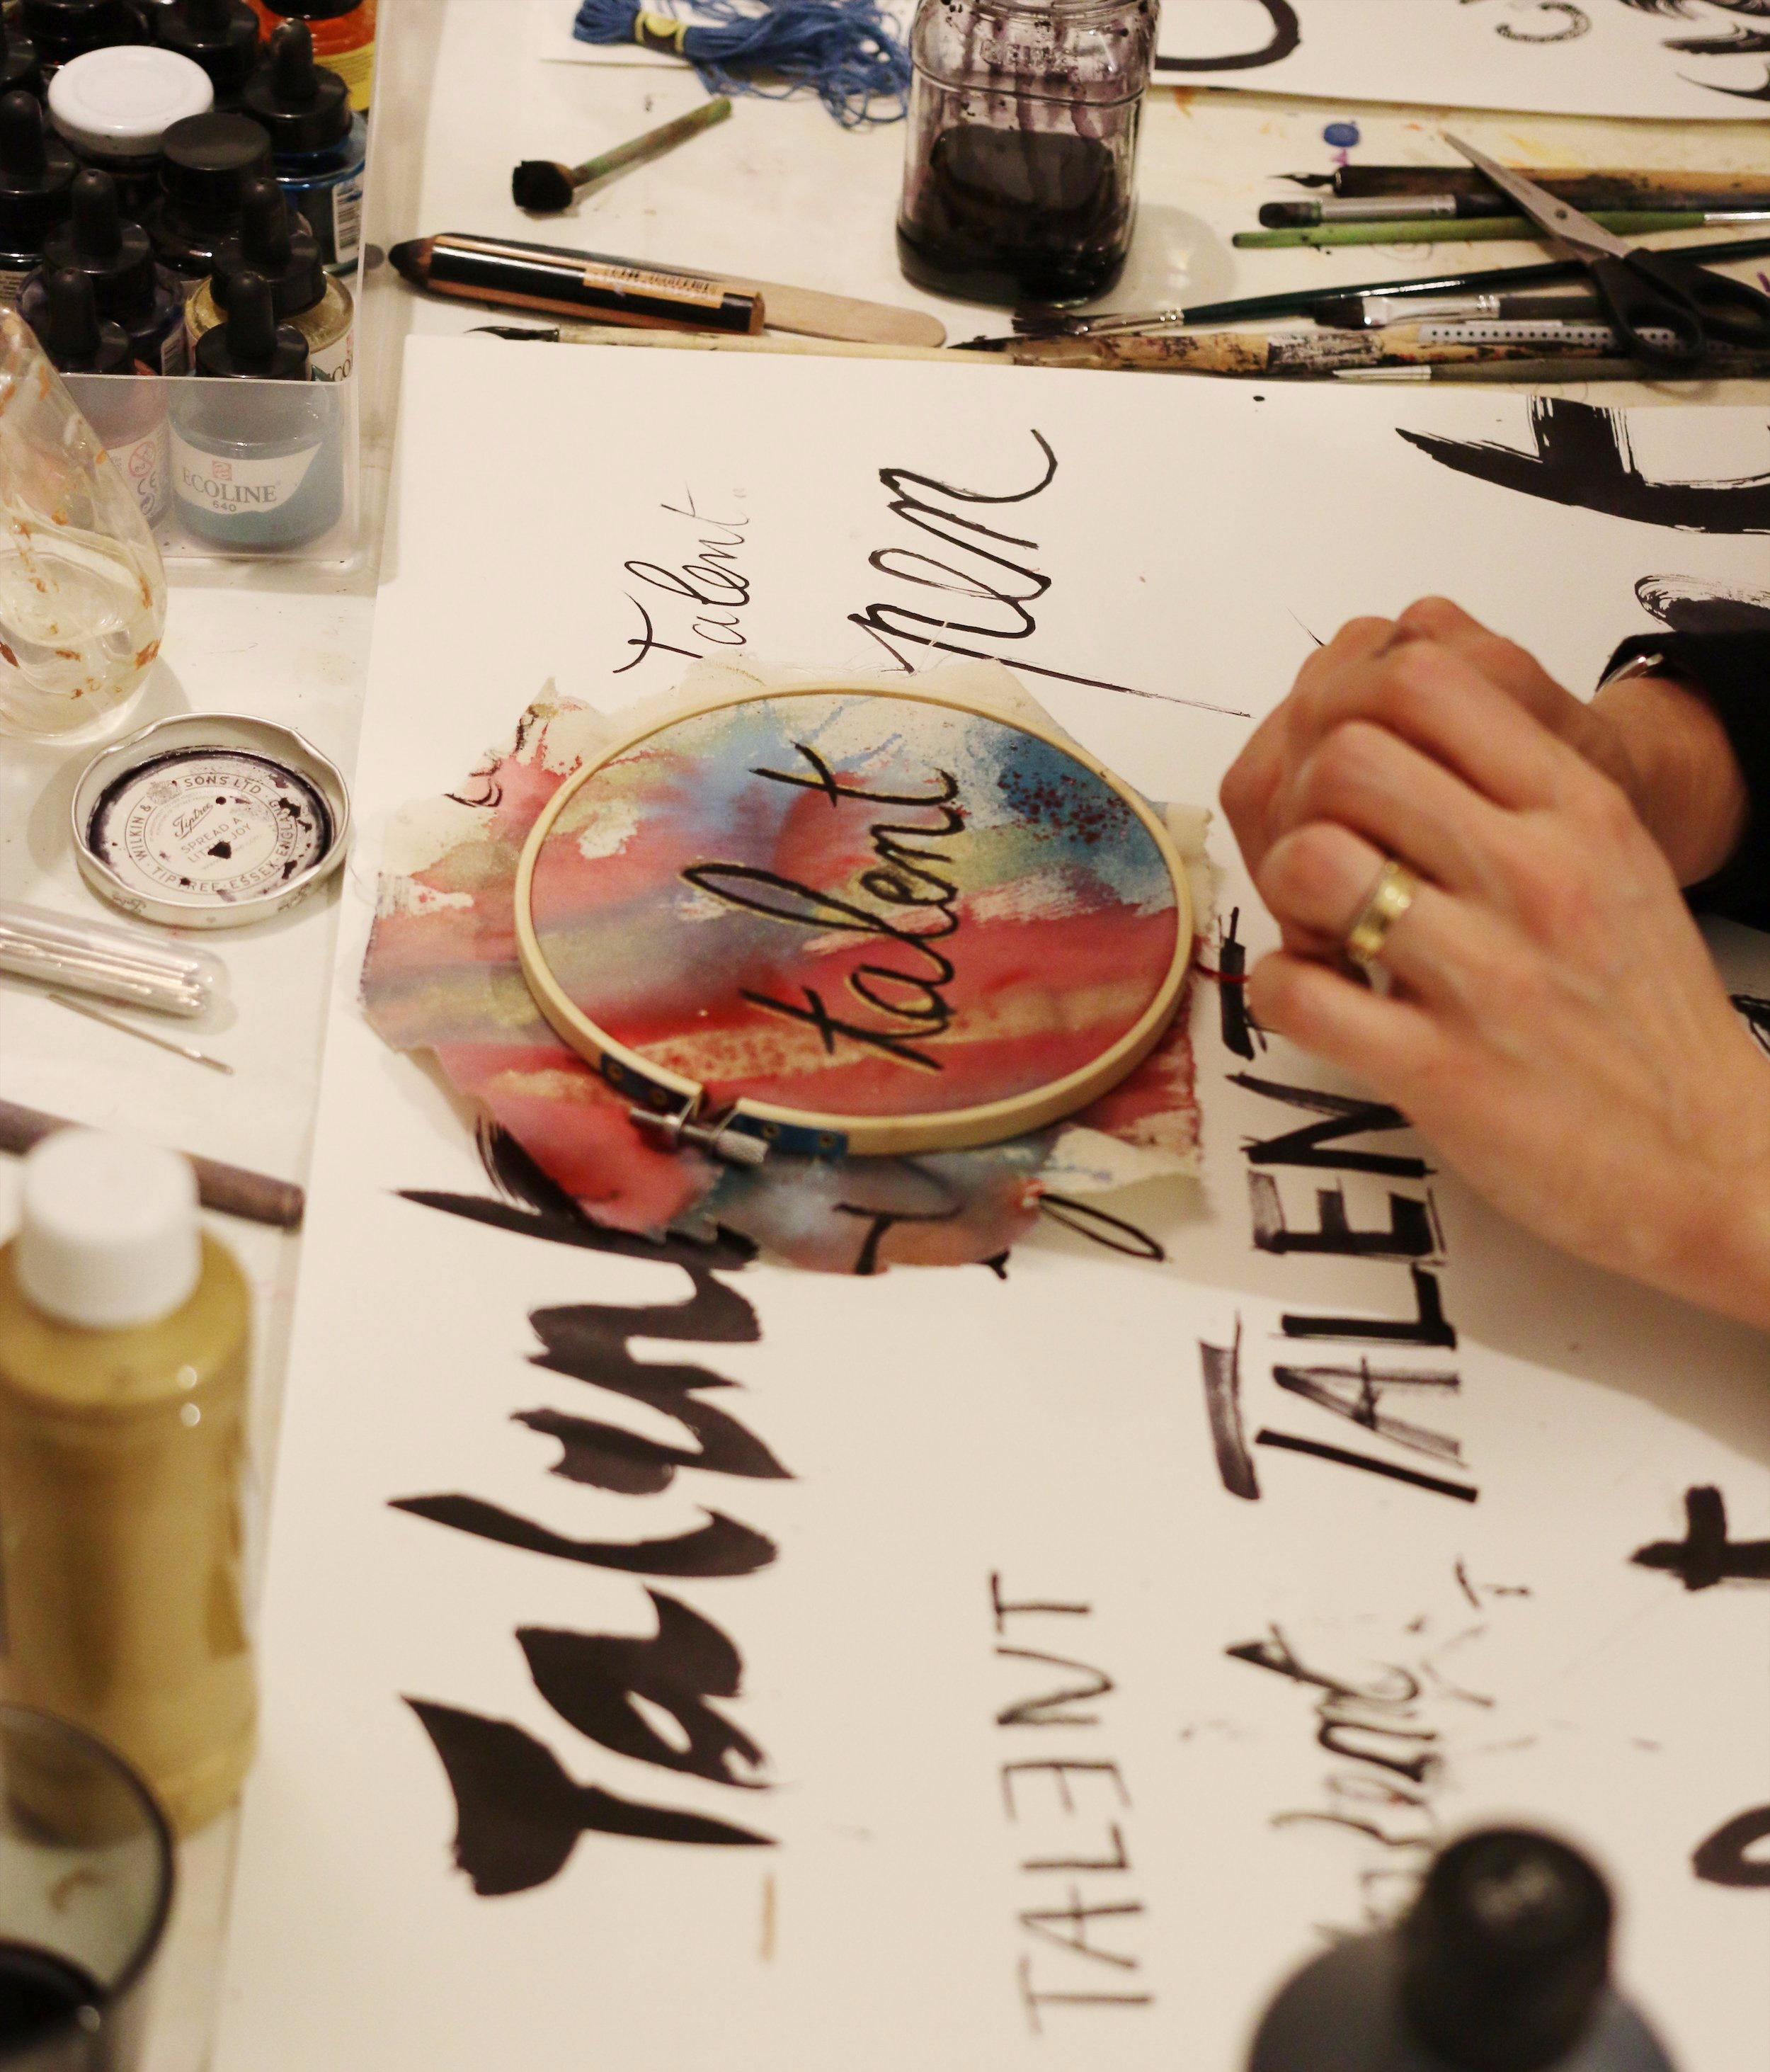 Creative+Team+building%2C+Berlin%2C+watercolour+art+workshop